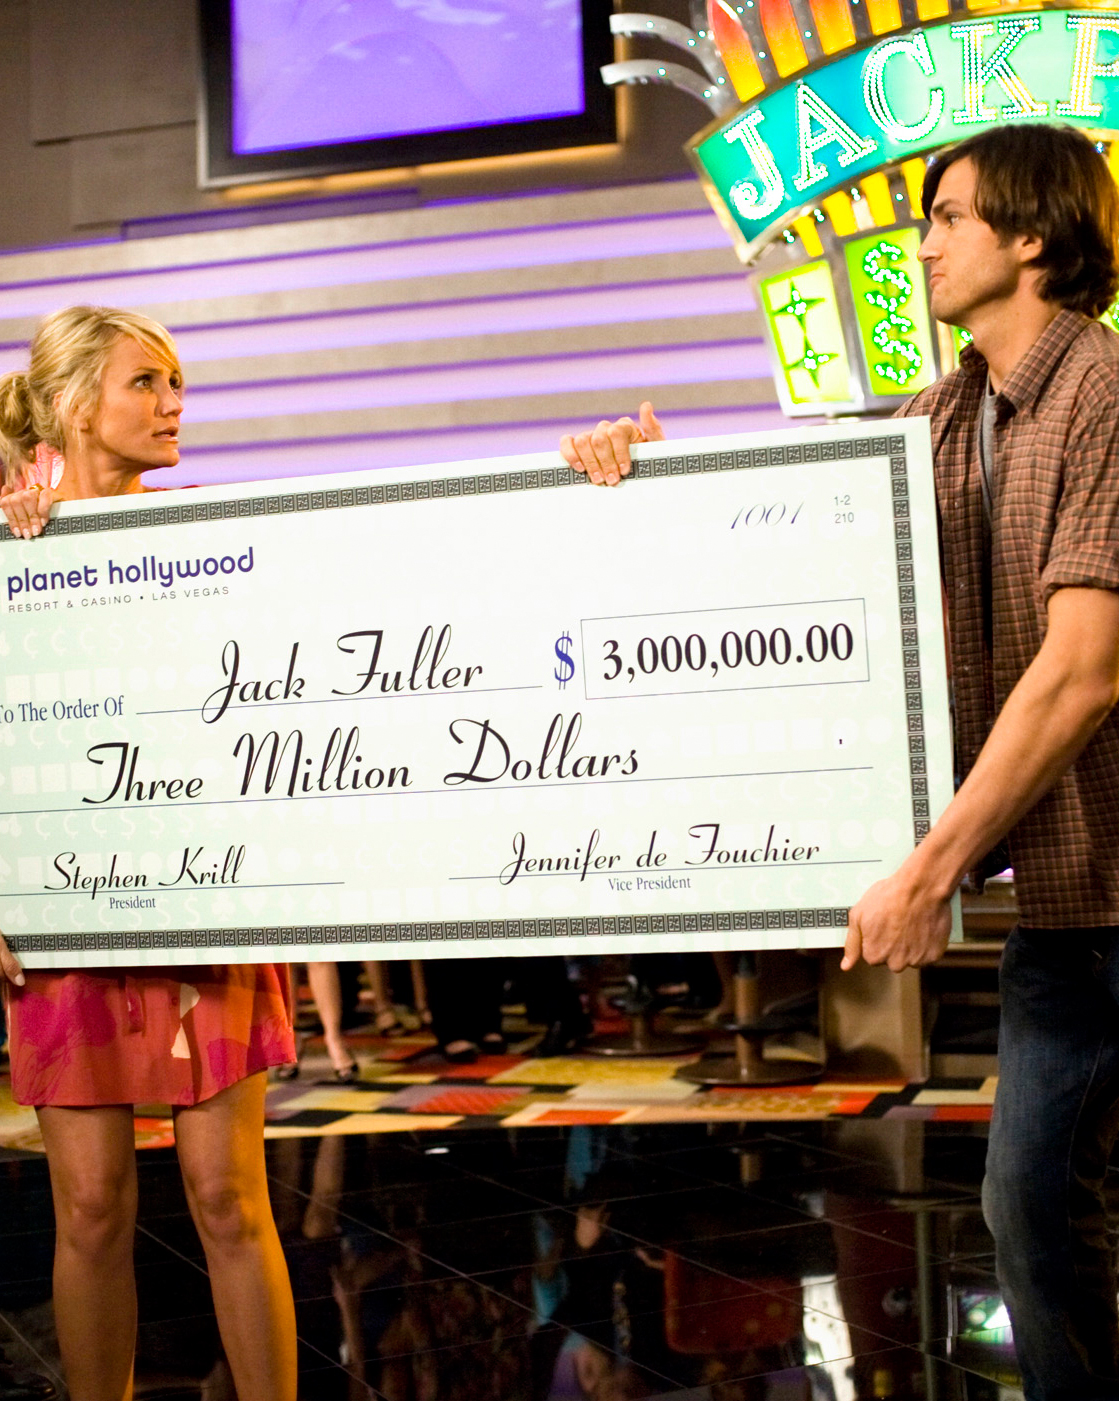 couple-money-tips-what-happens-in-vegas-cameron-diaz-ashton-kutcher-fight-over-jackpot-check-1015.jpg